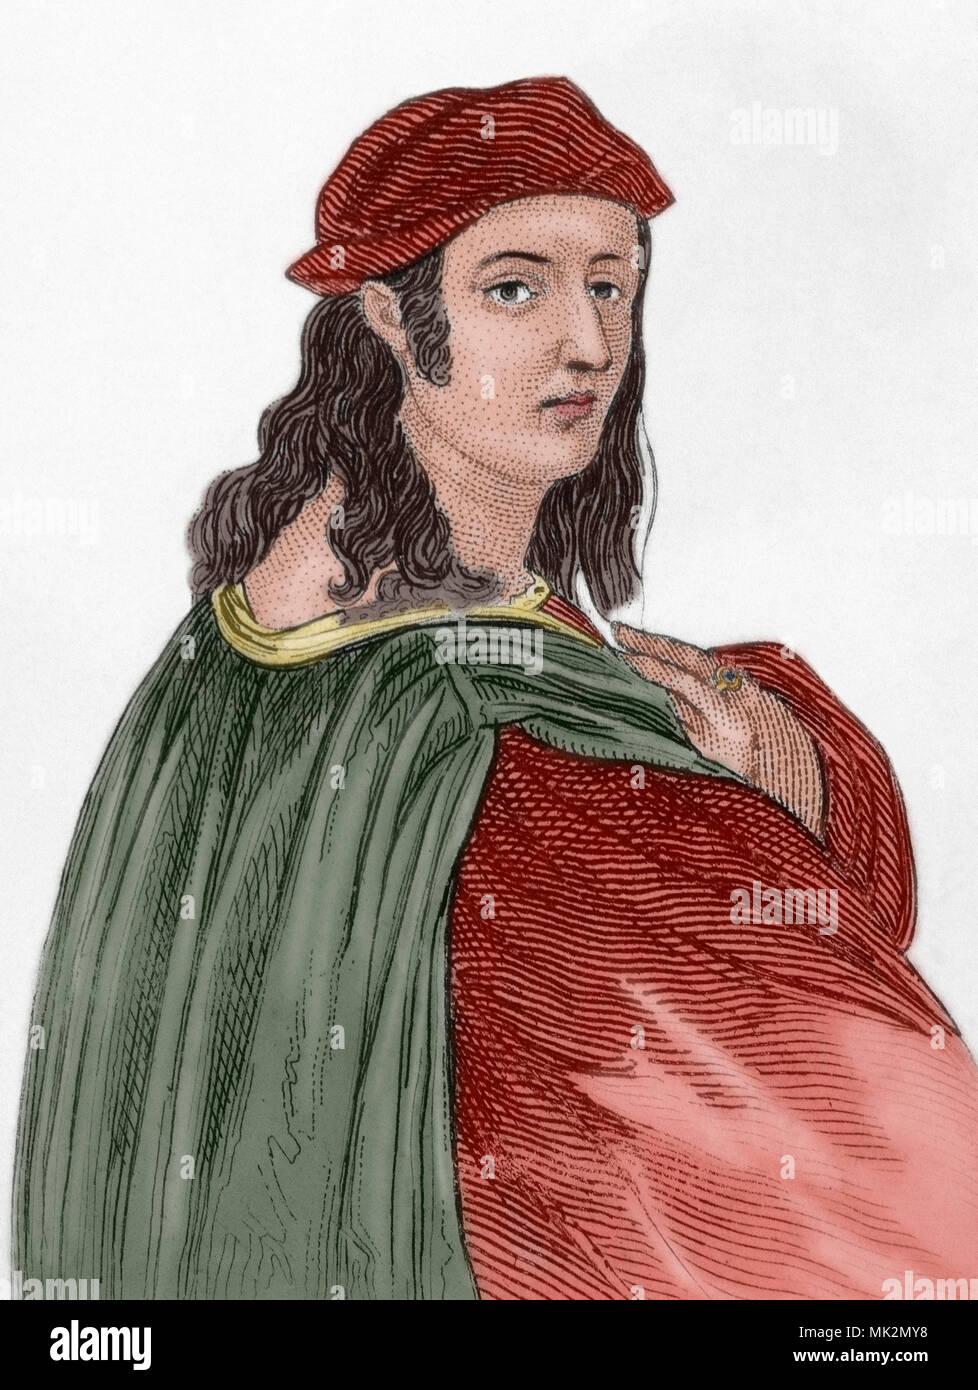 Raphael, Raffaello Sanzio da Urbino (Urbino, 1483-Rome, 1520). Italian artist of the Renaissance. Engraving. Later colouration. Stock Photo